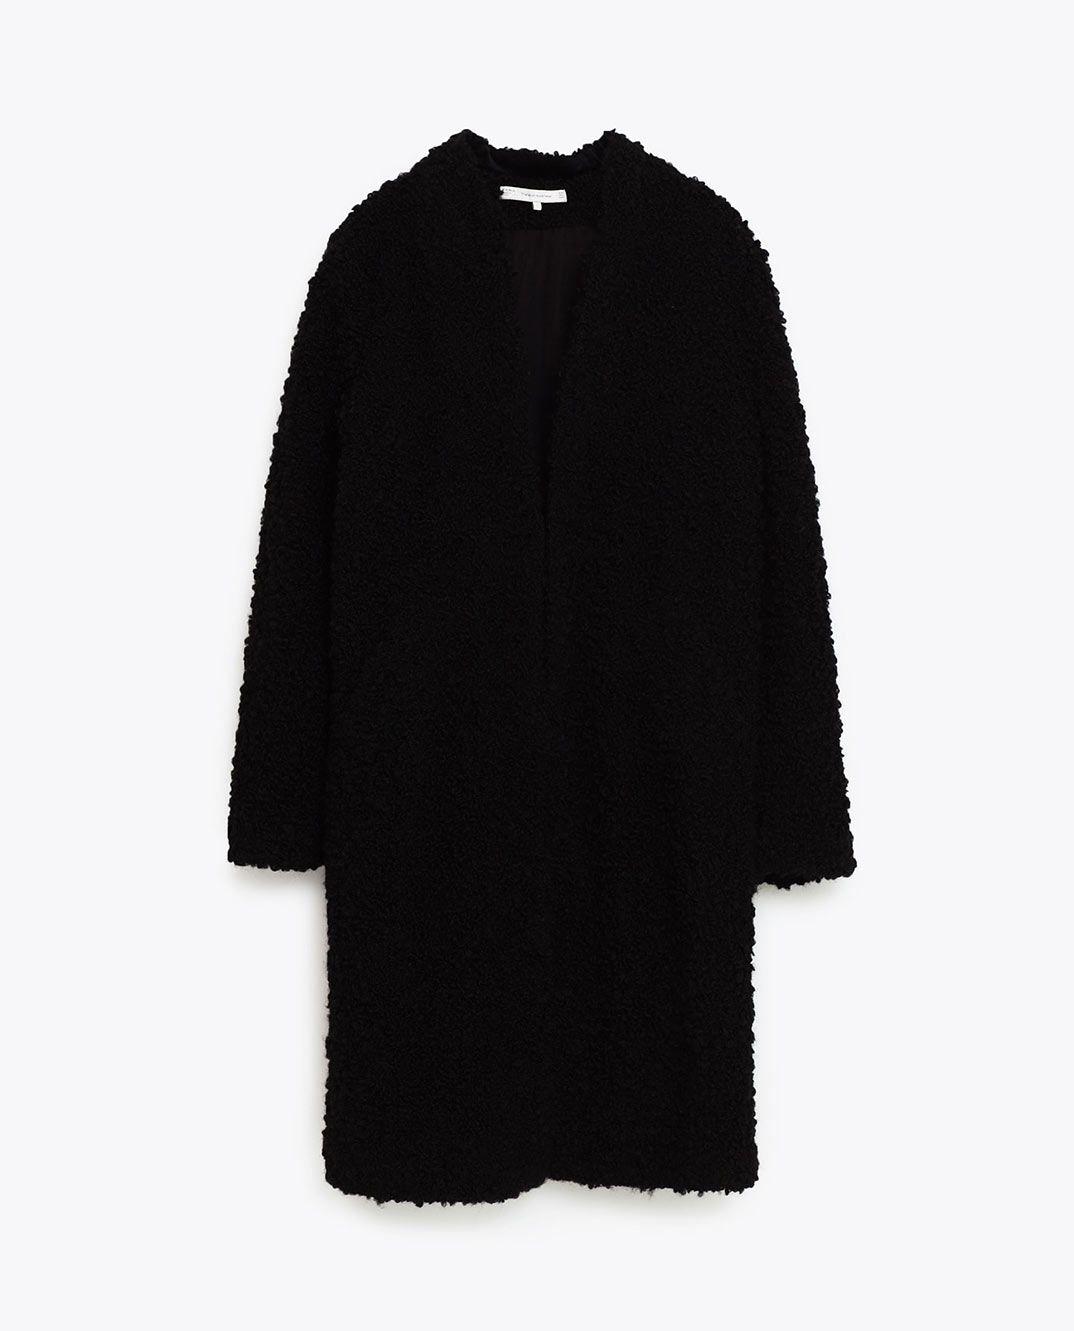 a-divina: Pantalones con raya lateral, ¿sí o no? #Moda #fashion Zara 59,95€